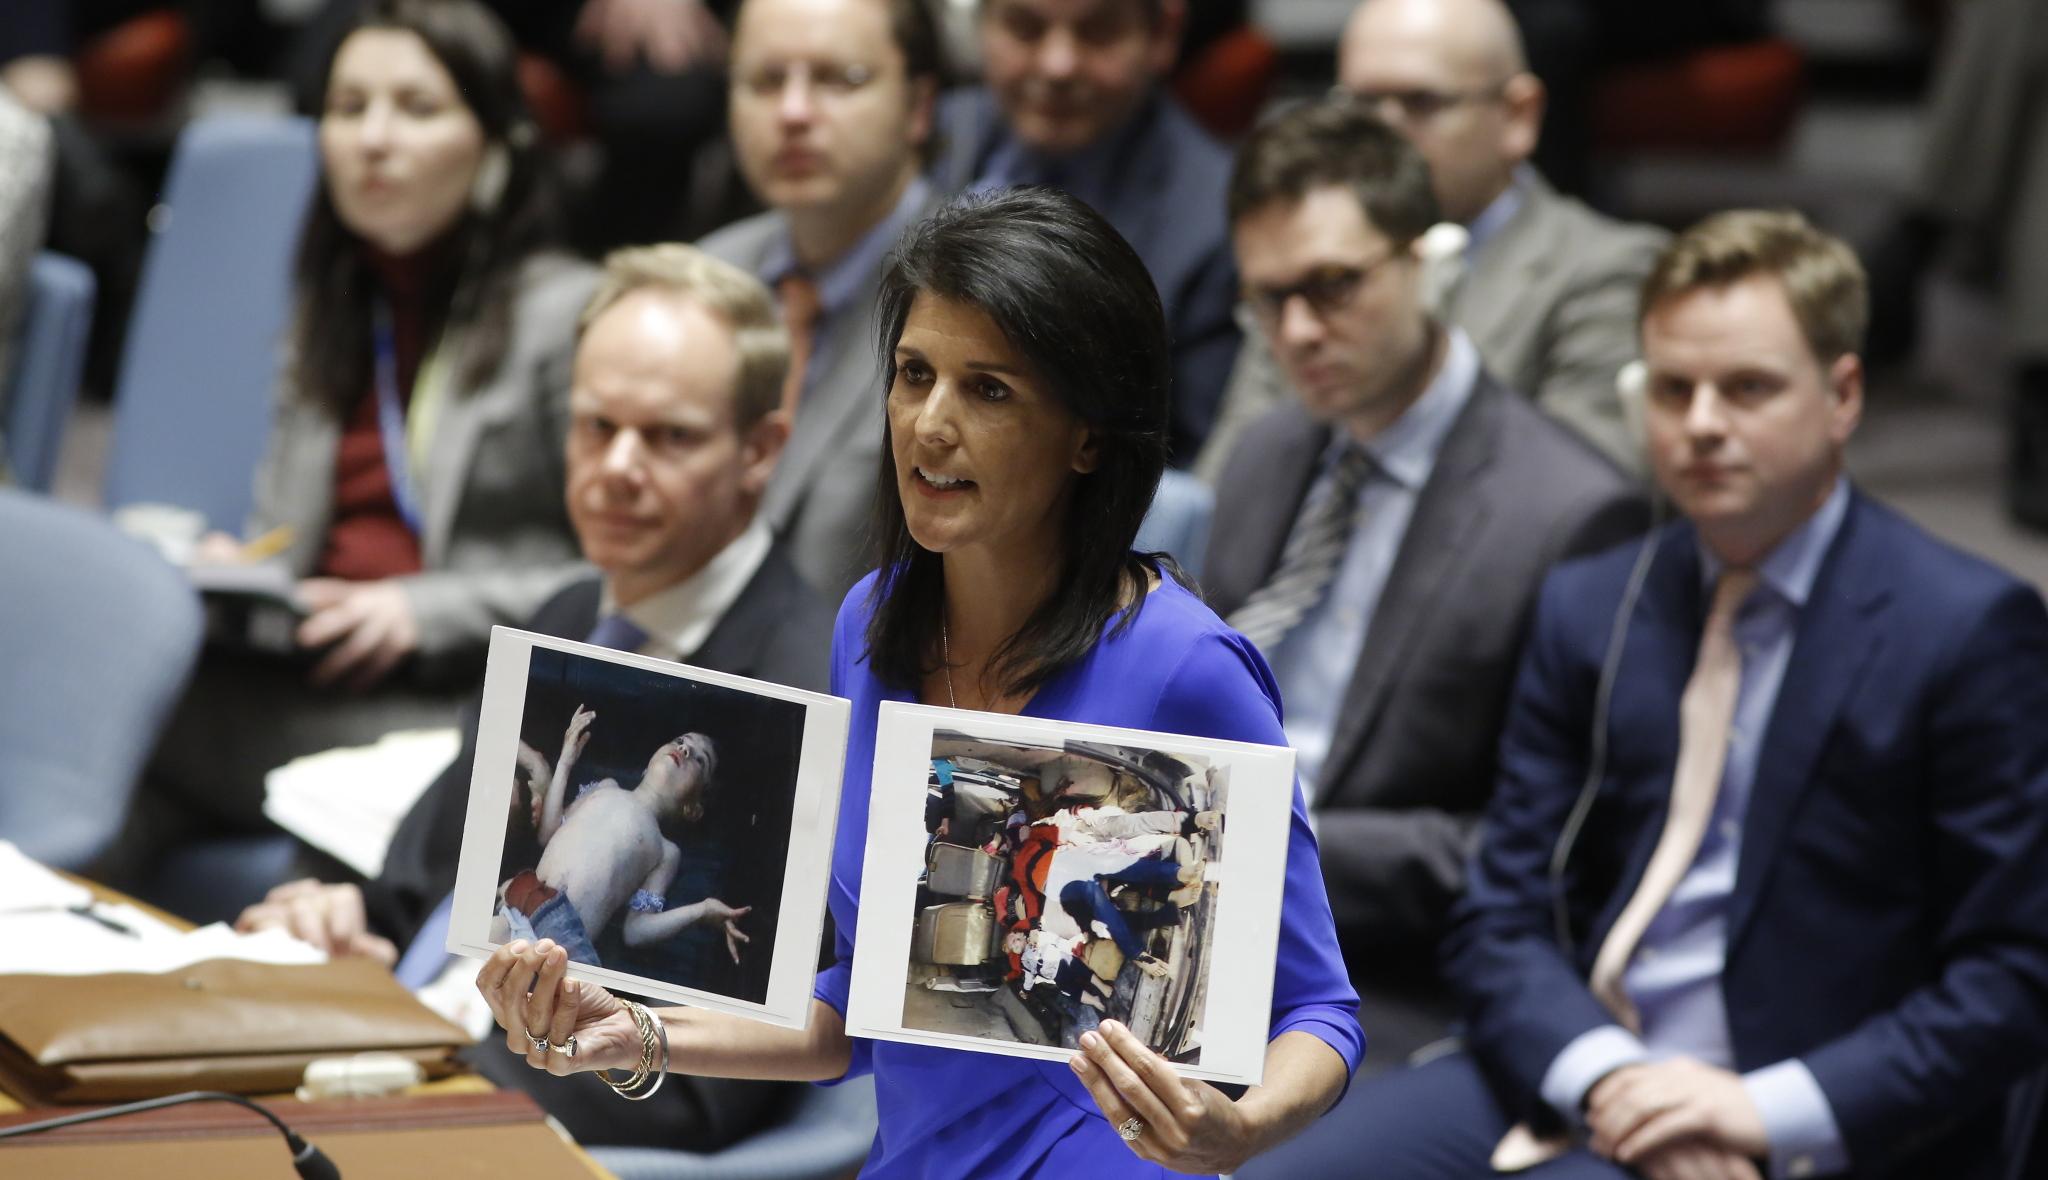 UN Ambassador_m.jpg